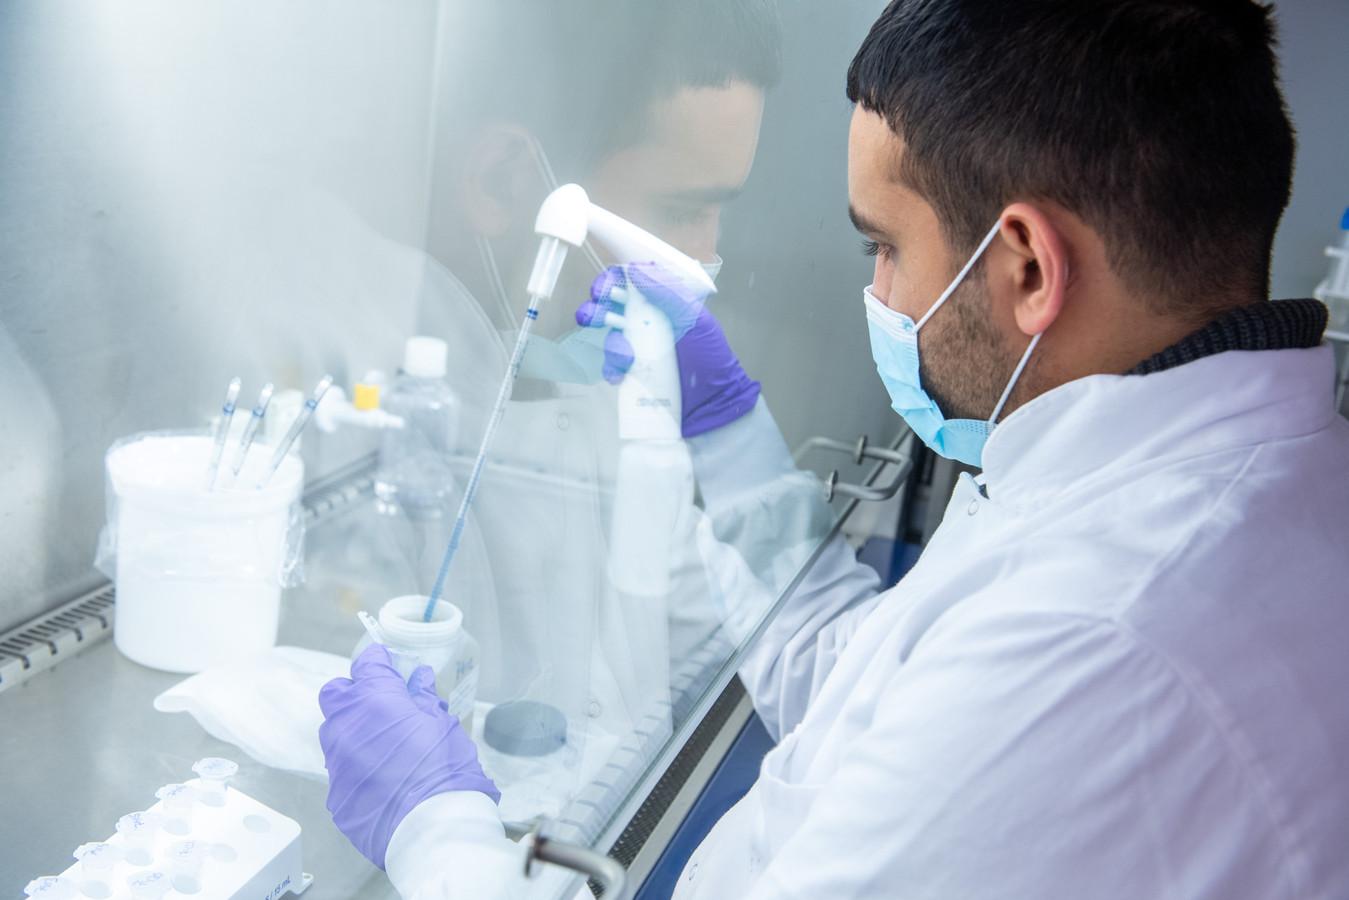 Rioolwateronderzoek in het RIVM-laboratorium.